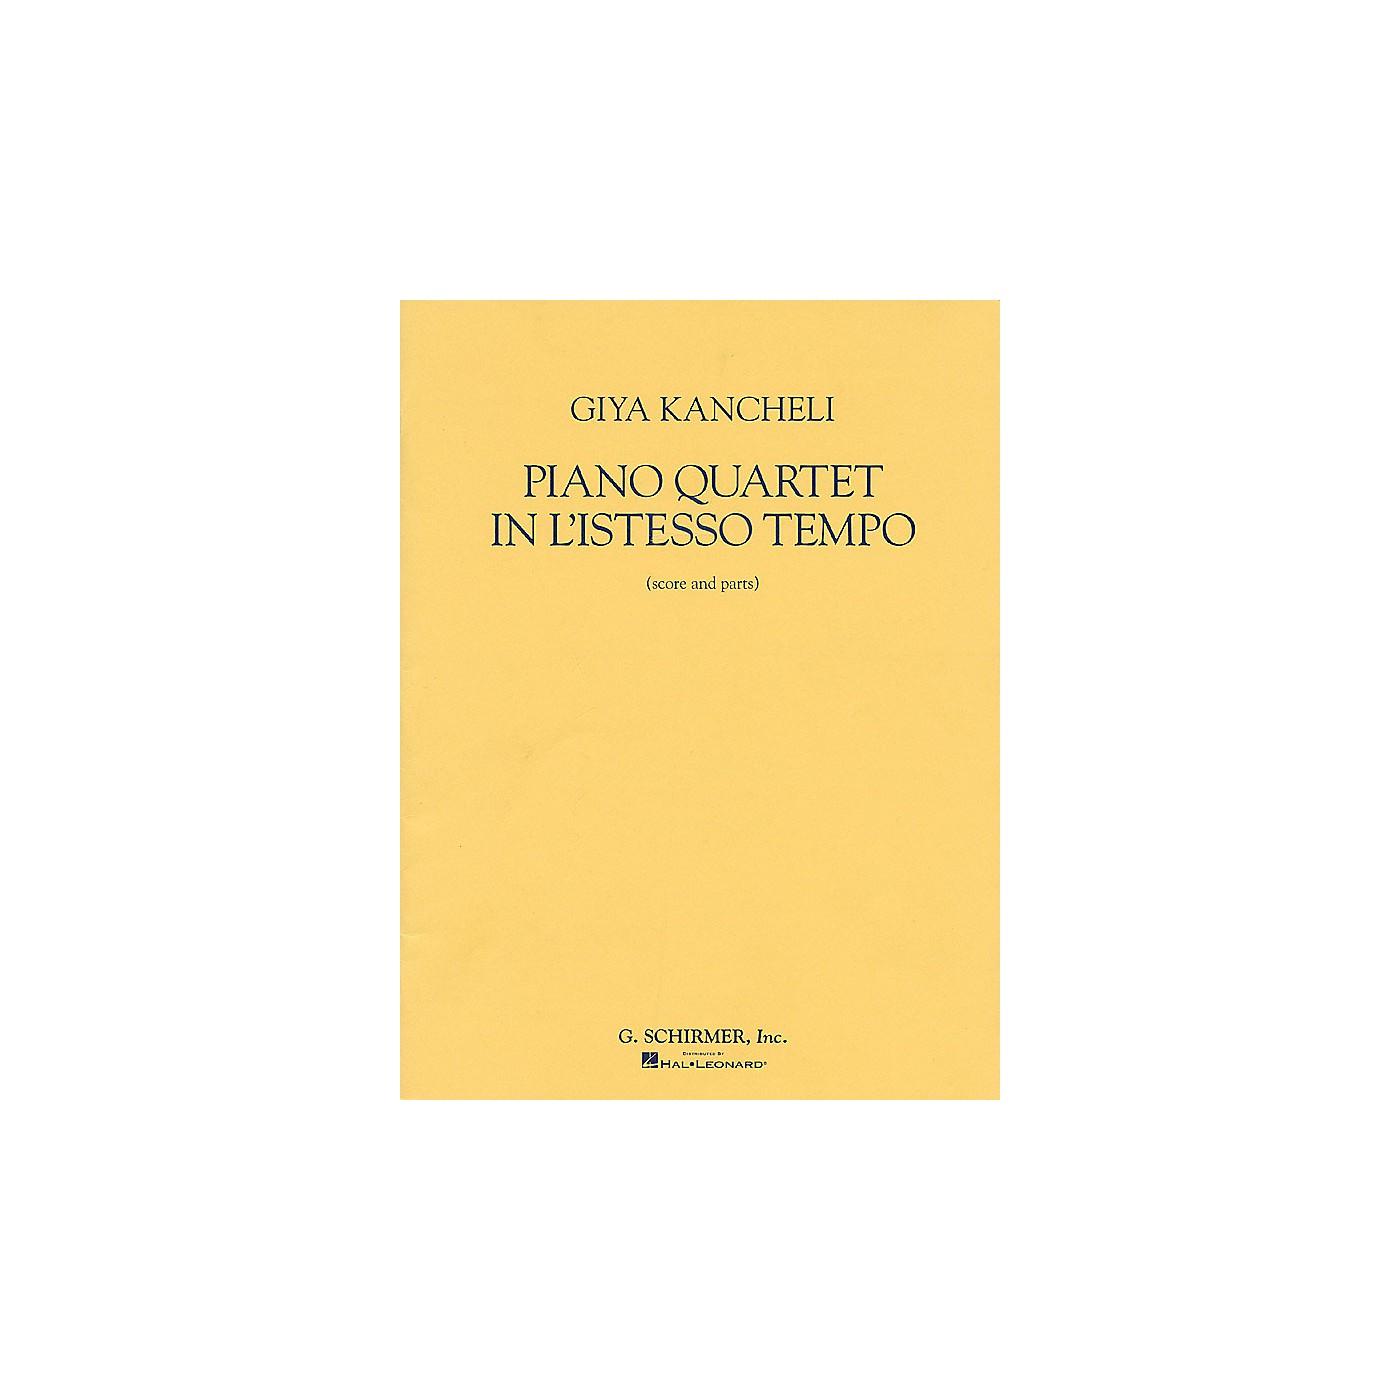 G. Schirmer Piano Quartet in L'Istesso Tempo (Score and Parts) String Ensemble Series by Giya Kancheli (Kantscheli) thumbnail